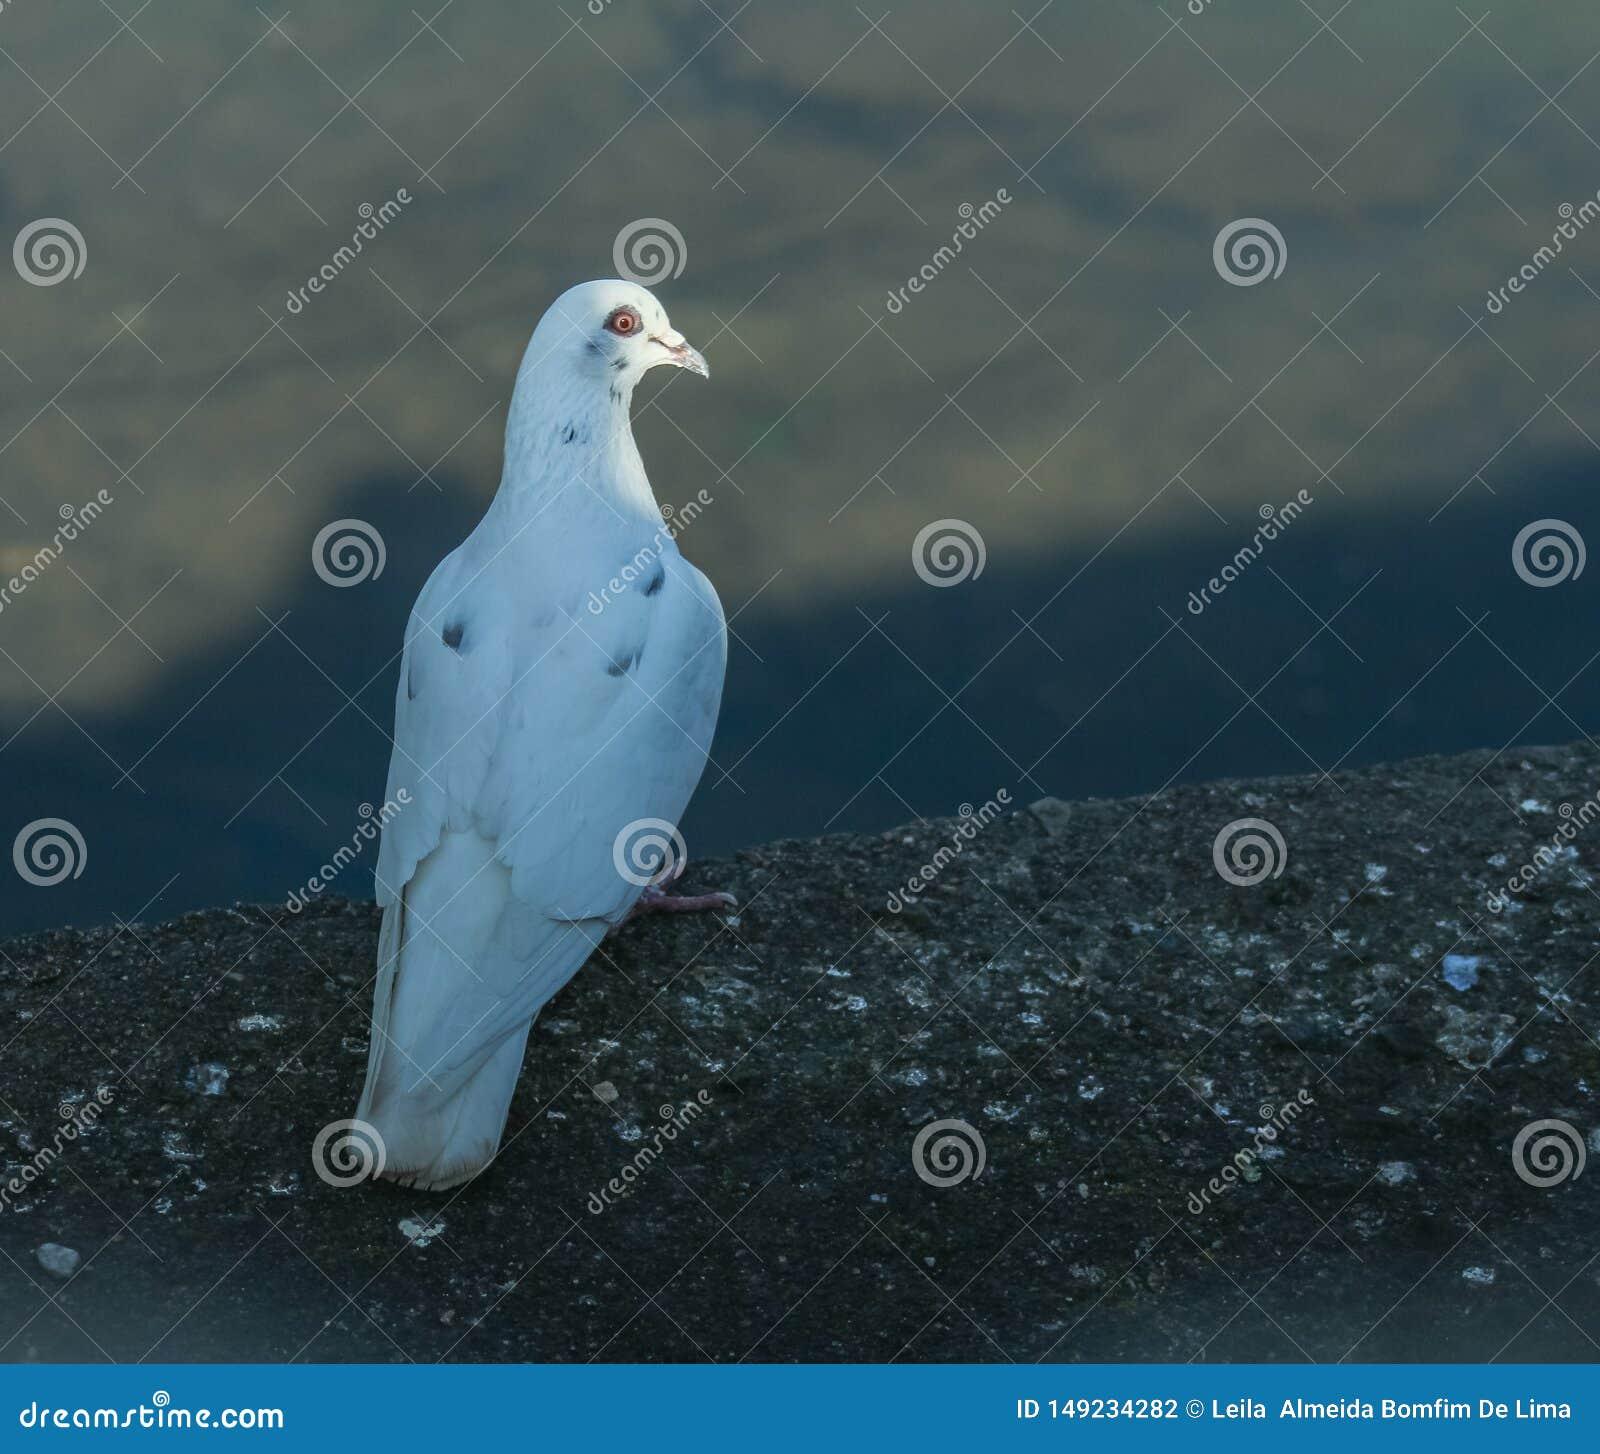 Une colombe blanche regarde une plaine